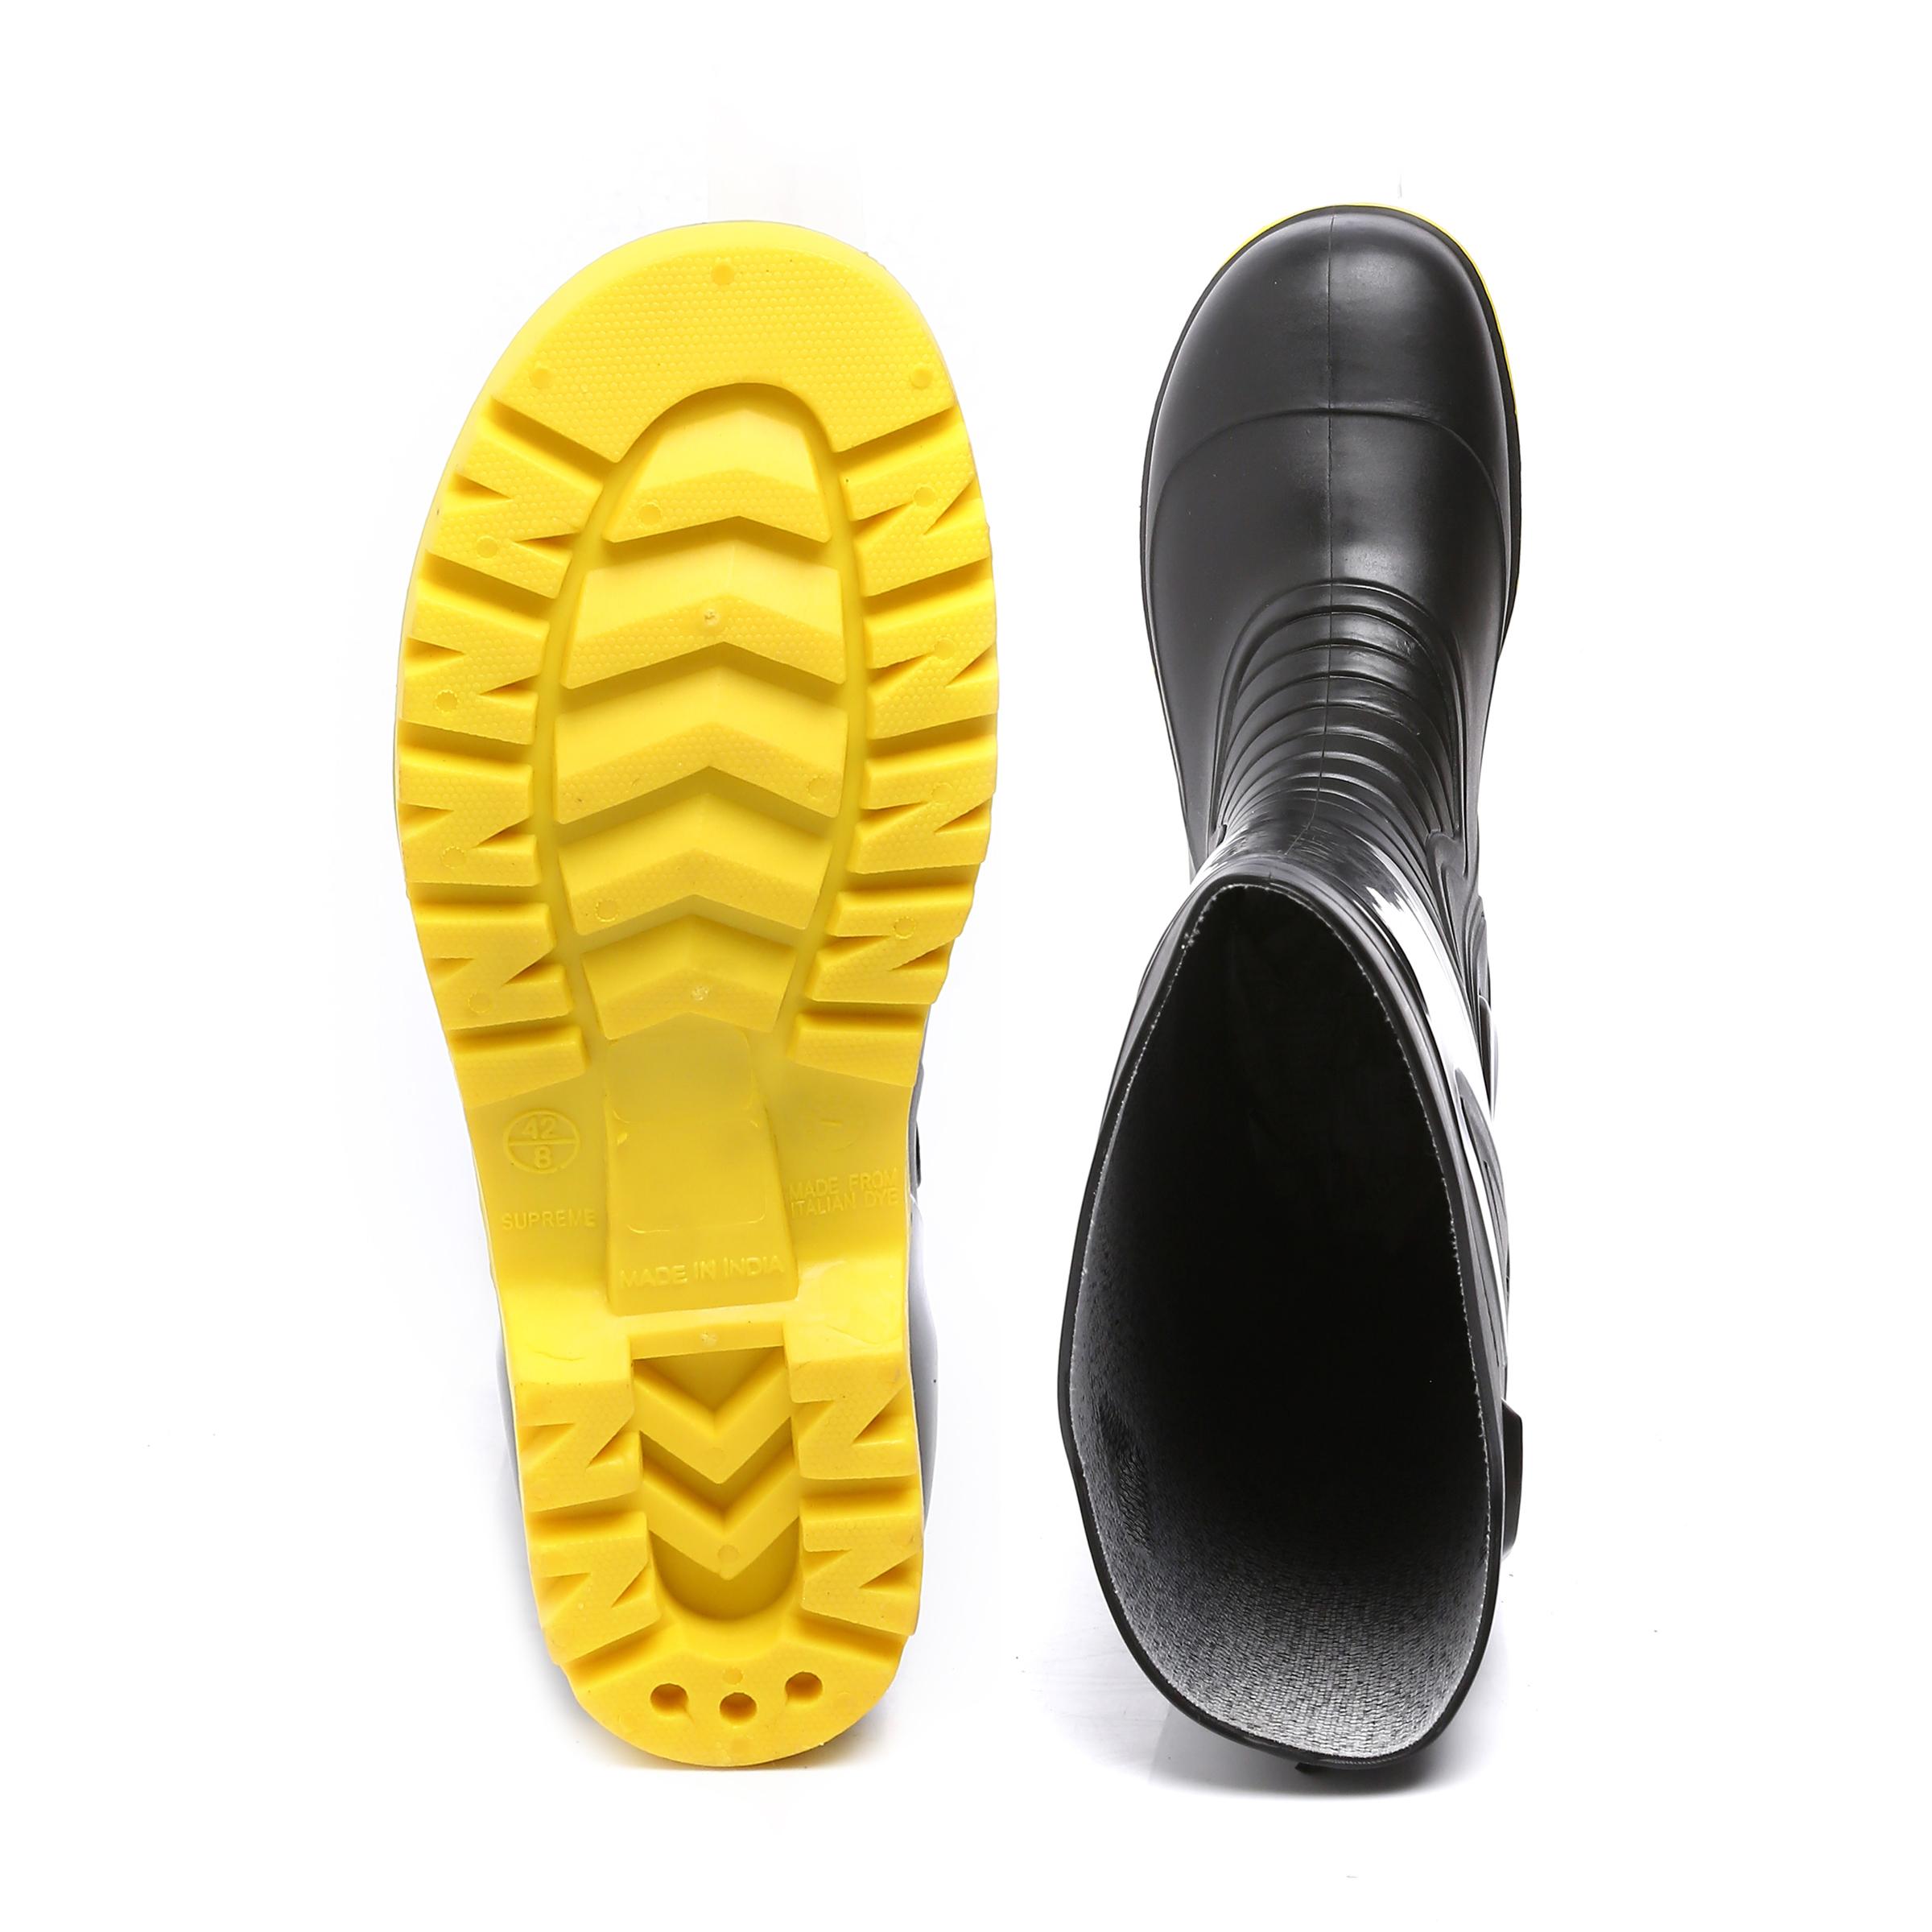 Dual Density Gum Boots